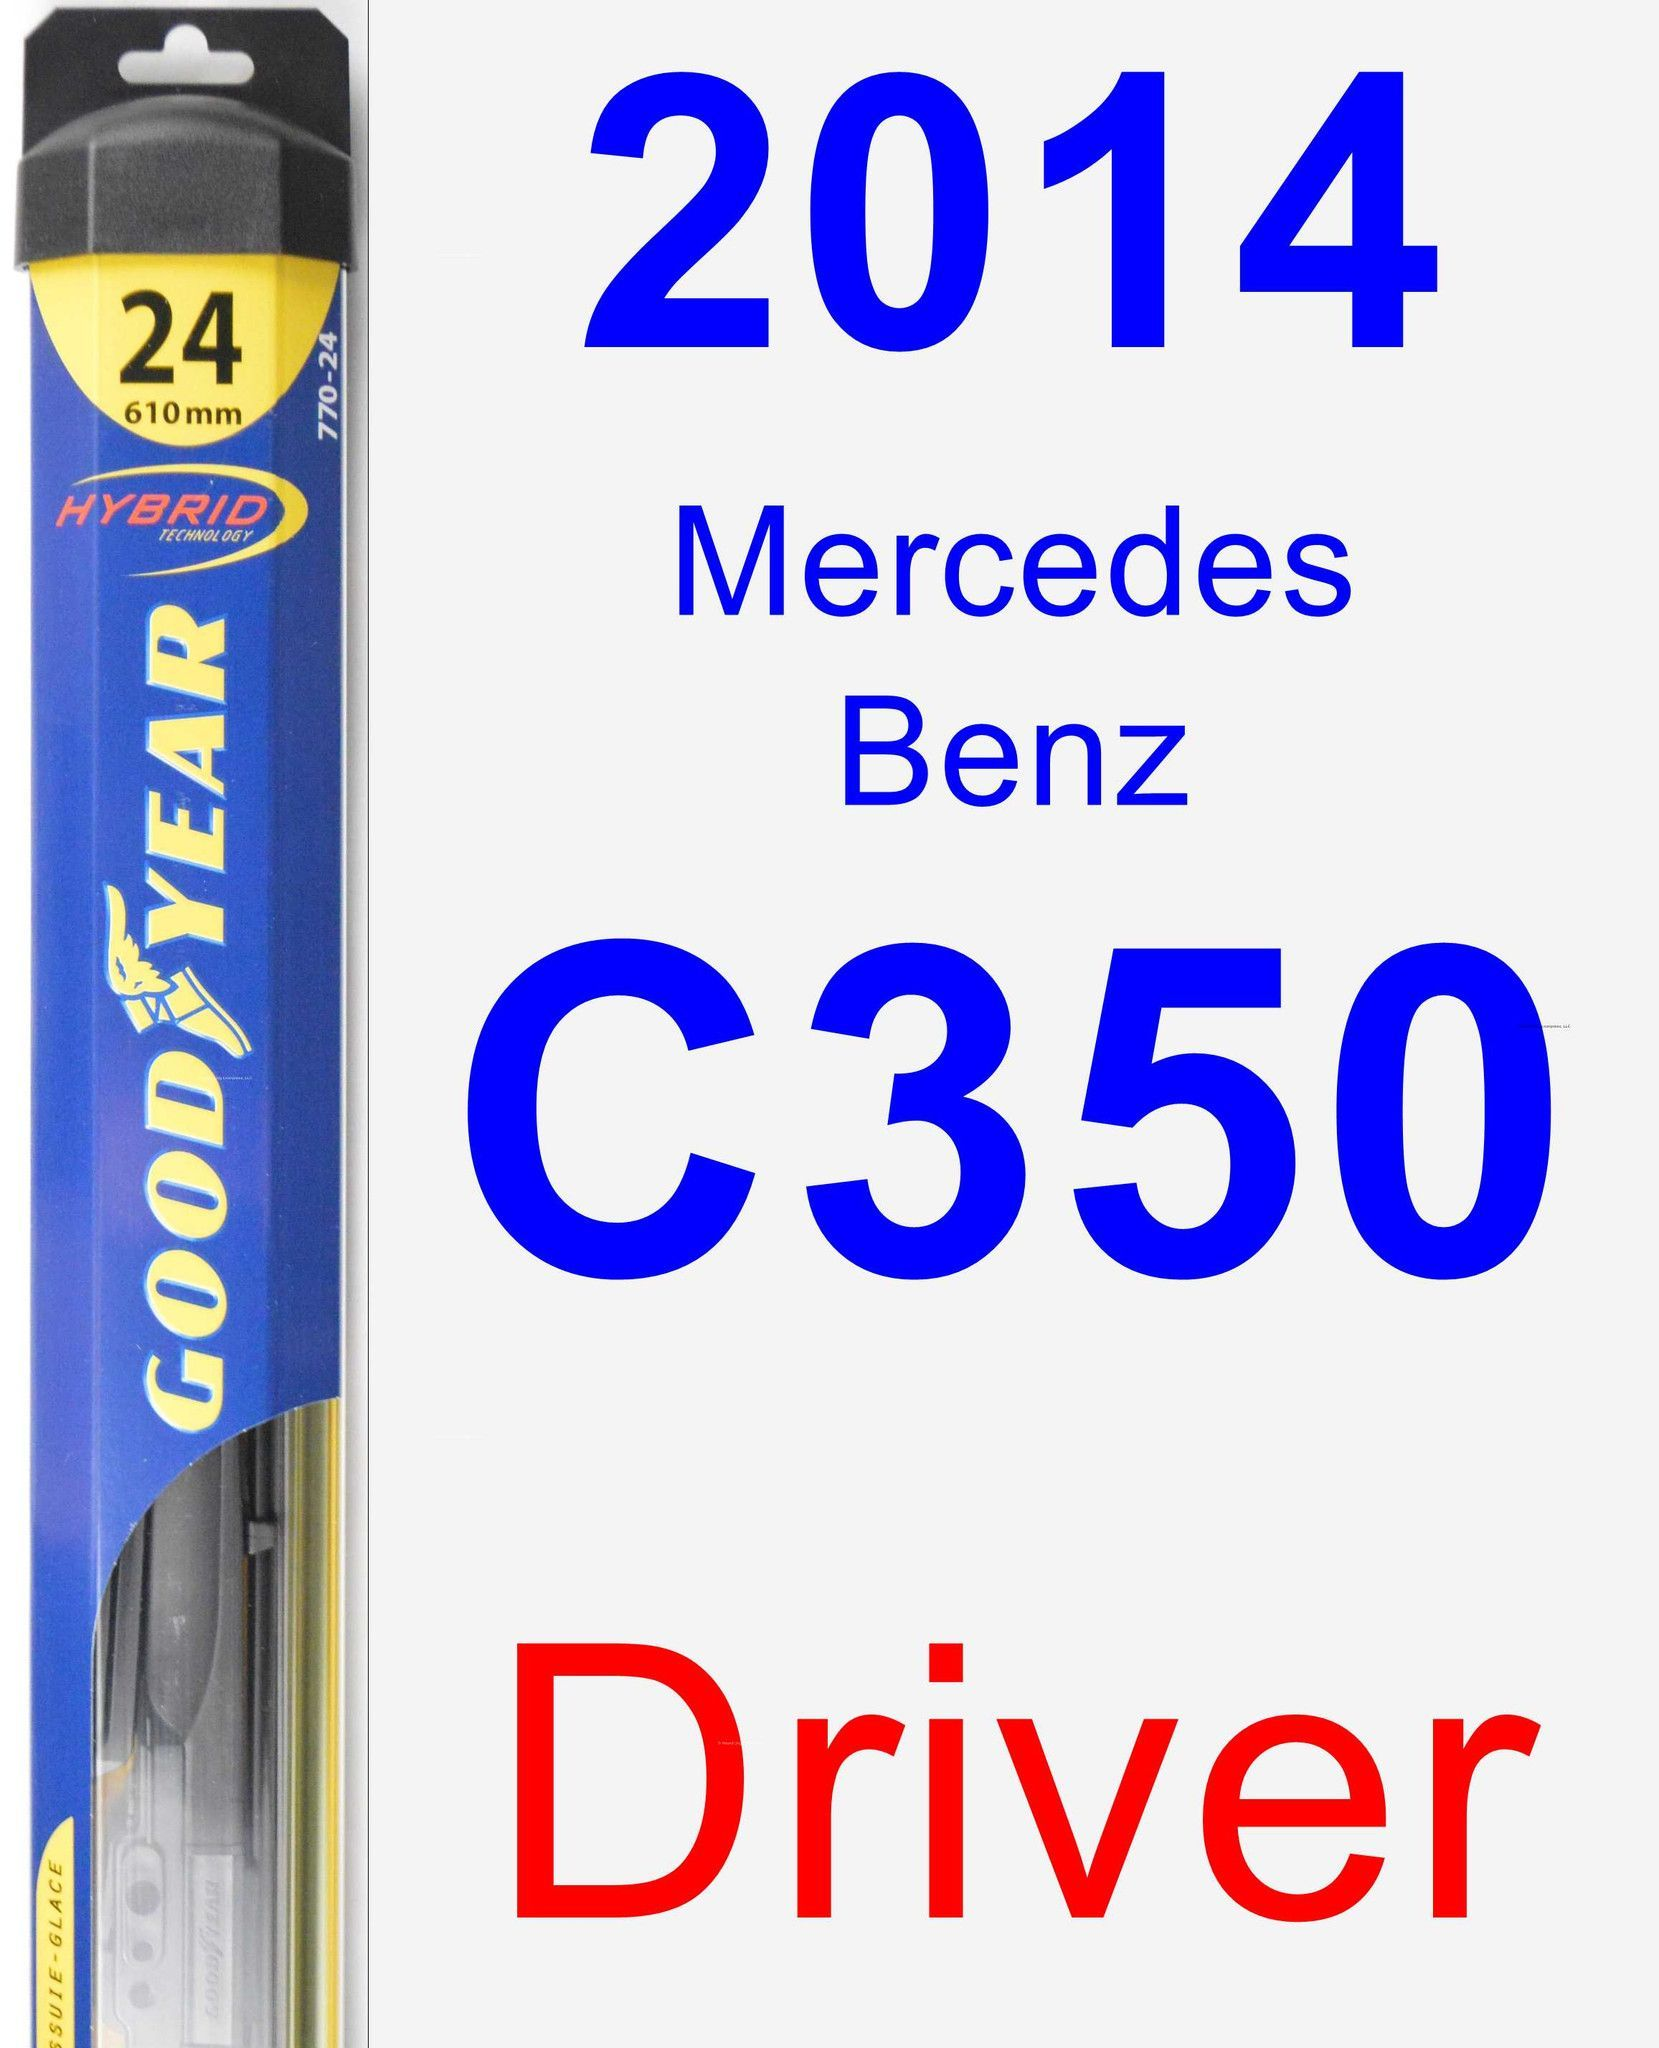 Kction Car Windshield Wiper Blade For Chevrolet Captiva Cruze